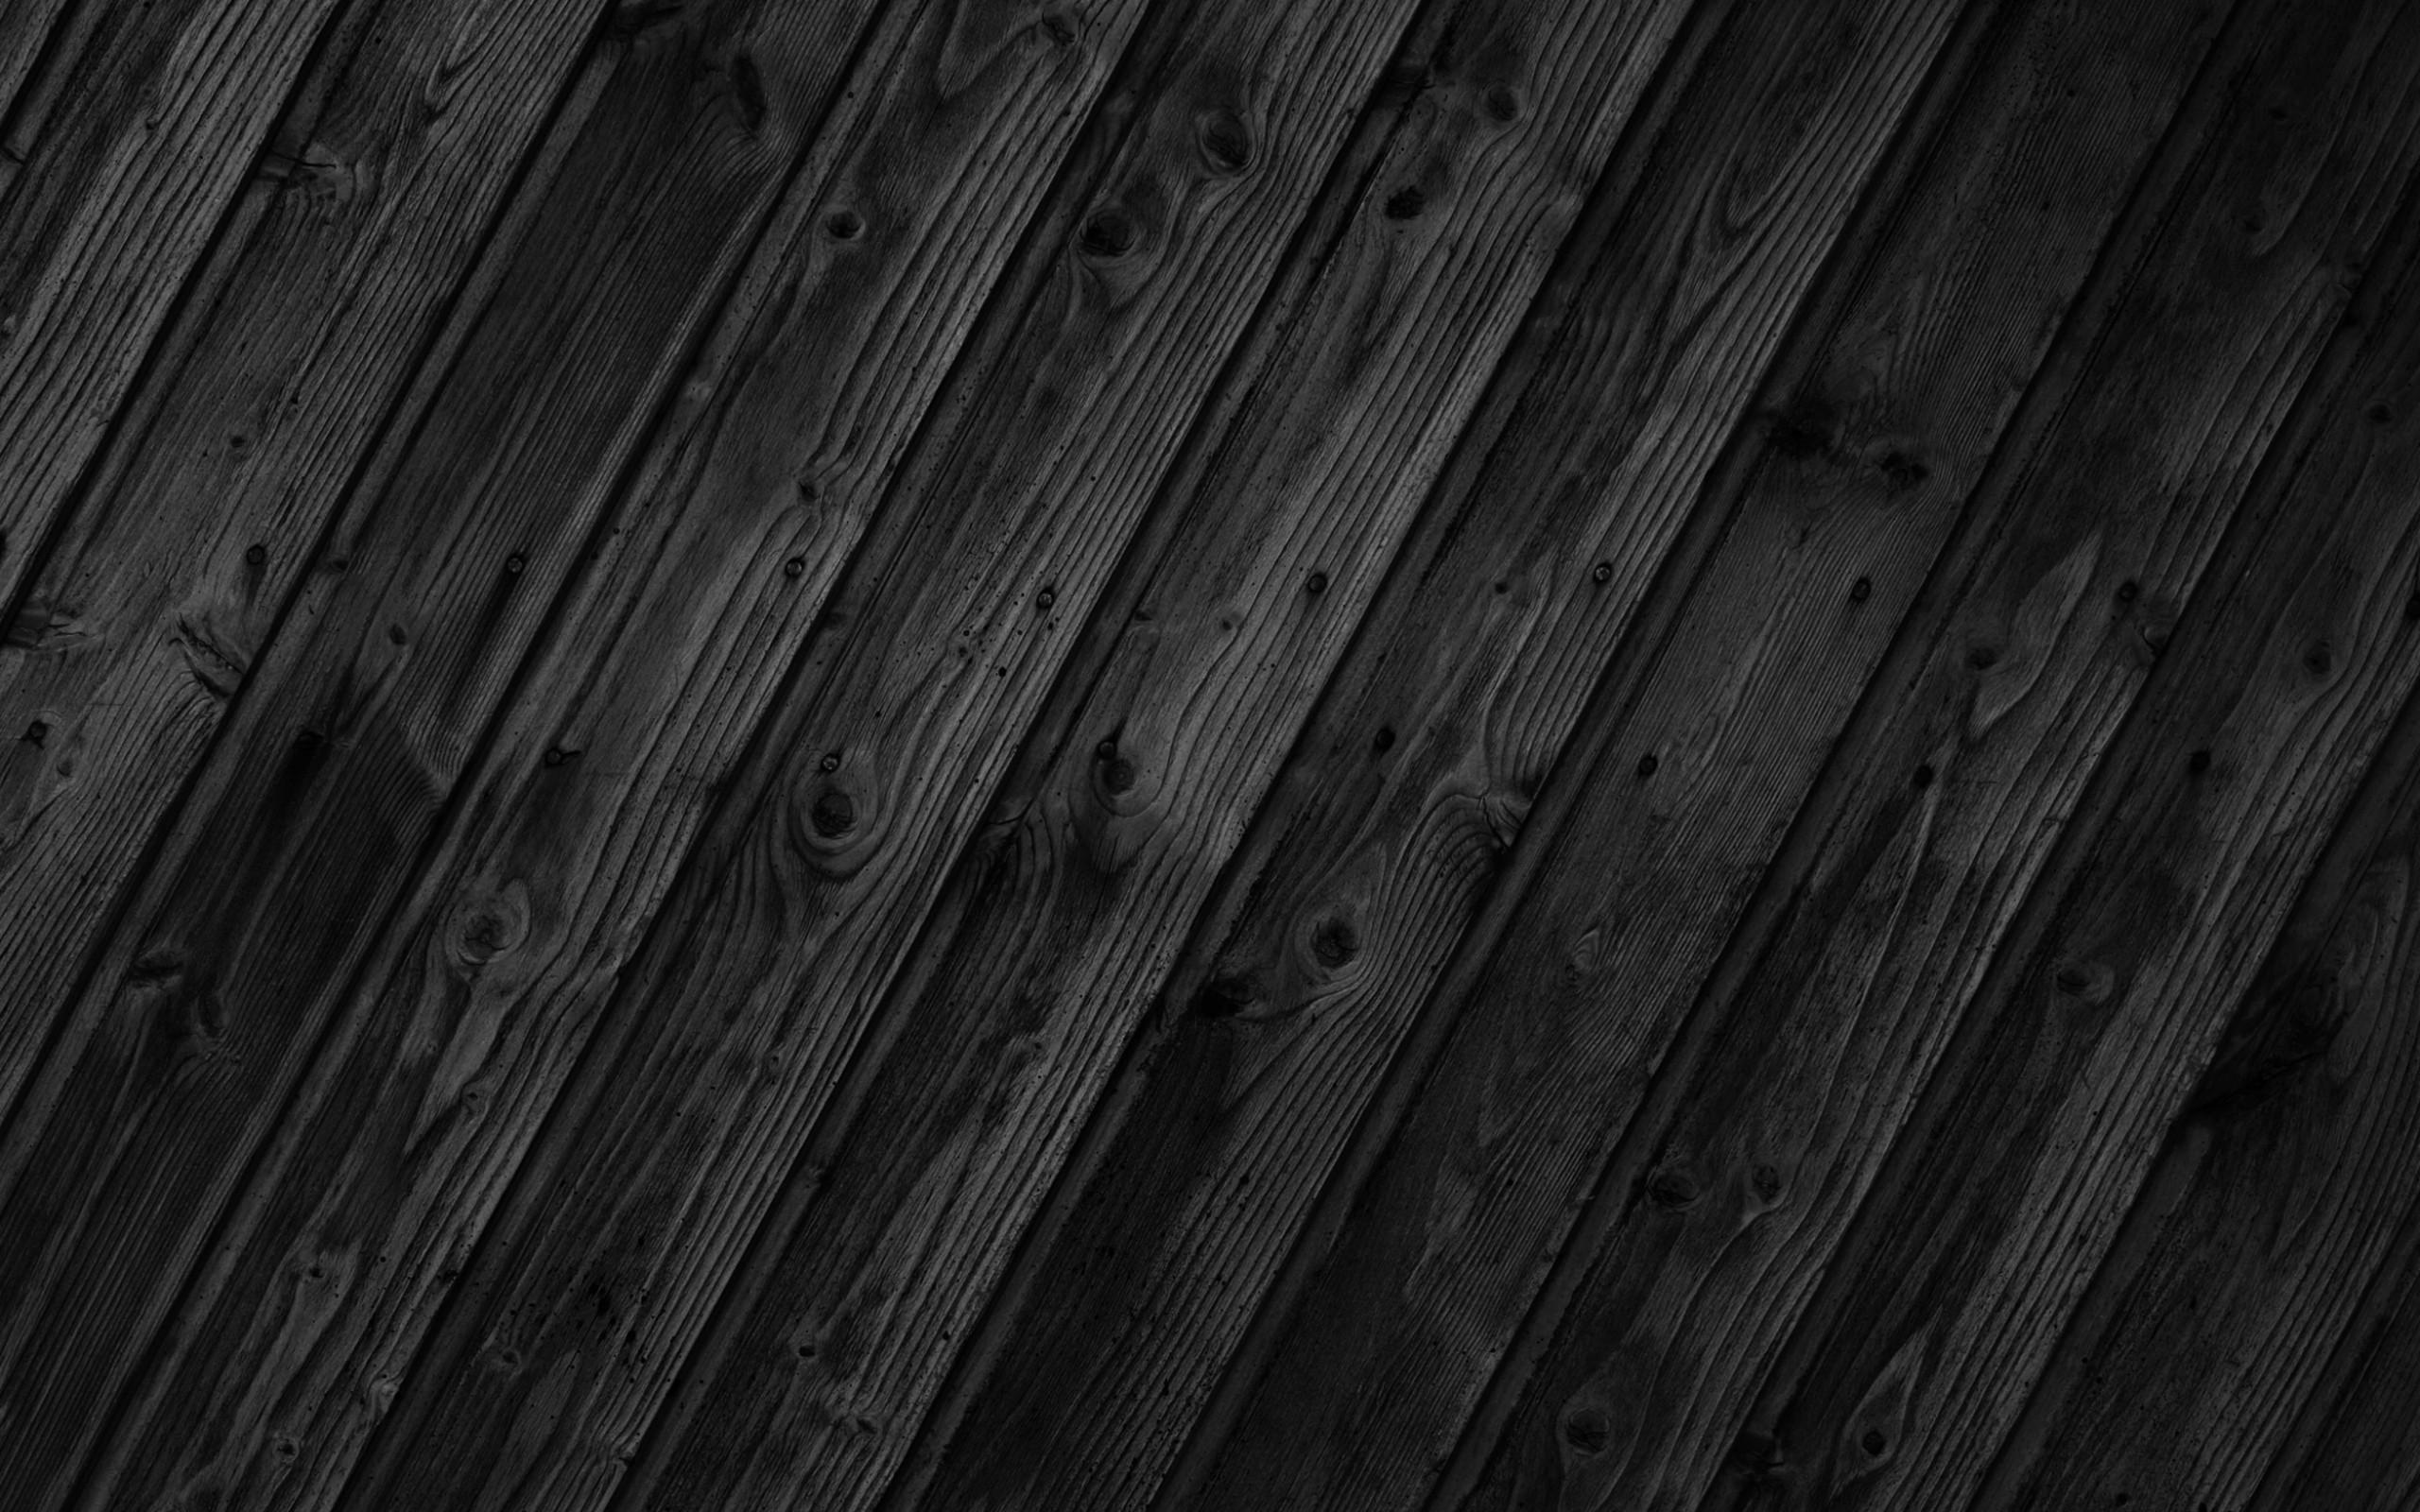 Black Wood Background Download Free Amazing Full Hd